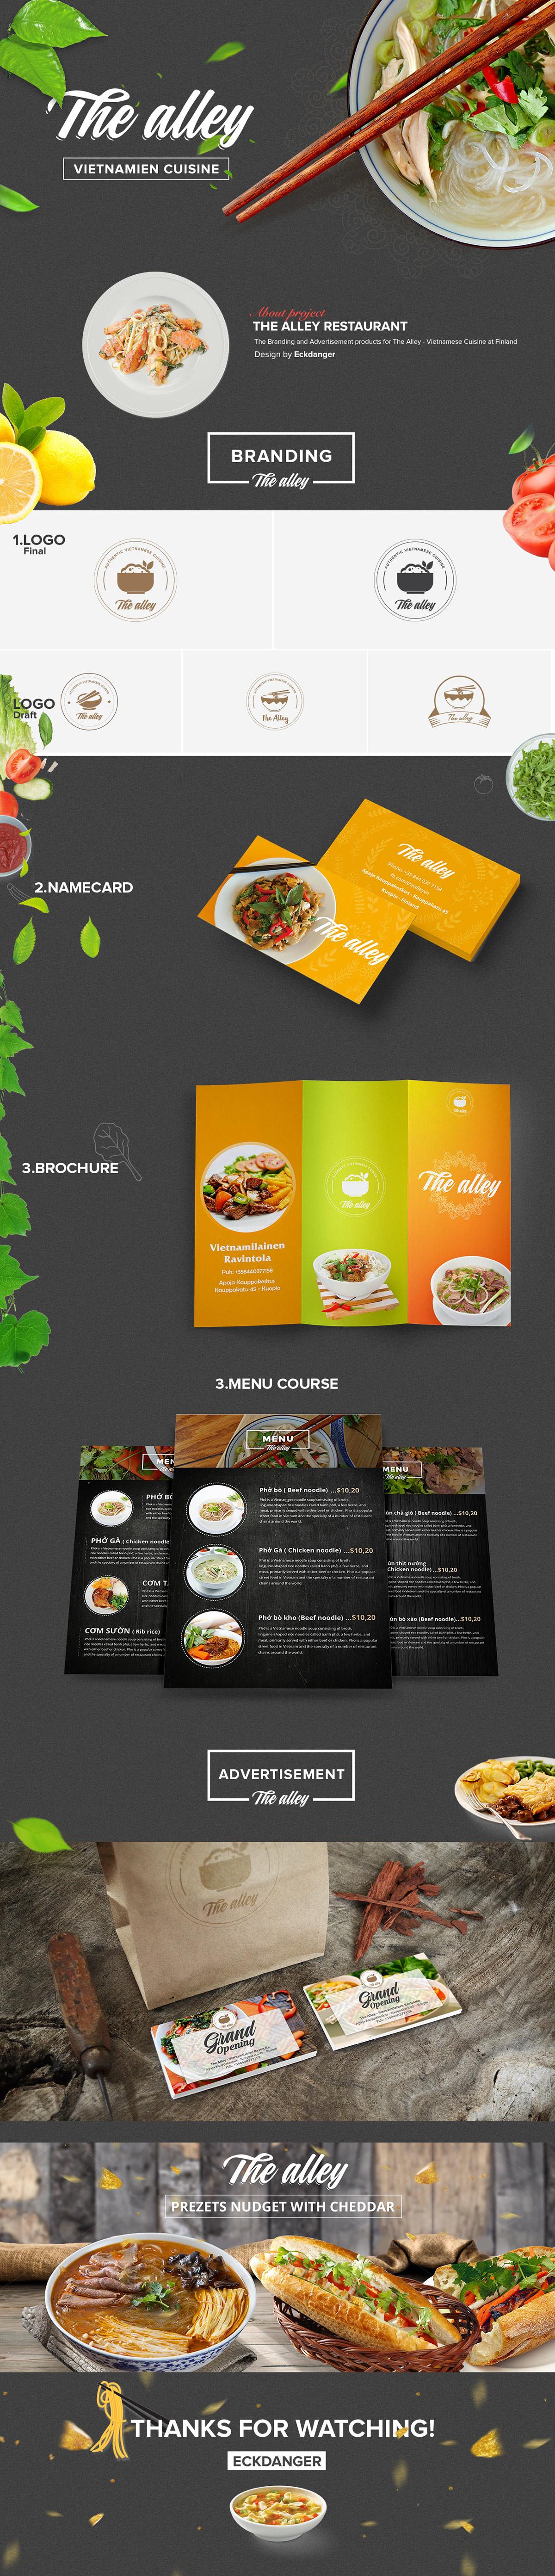 The Alley Restaurant Vietnam Food Cuisine On Behance